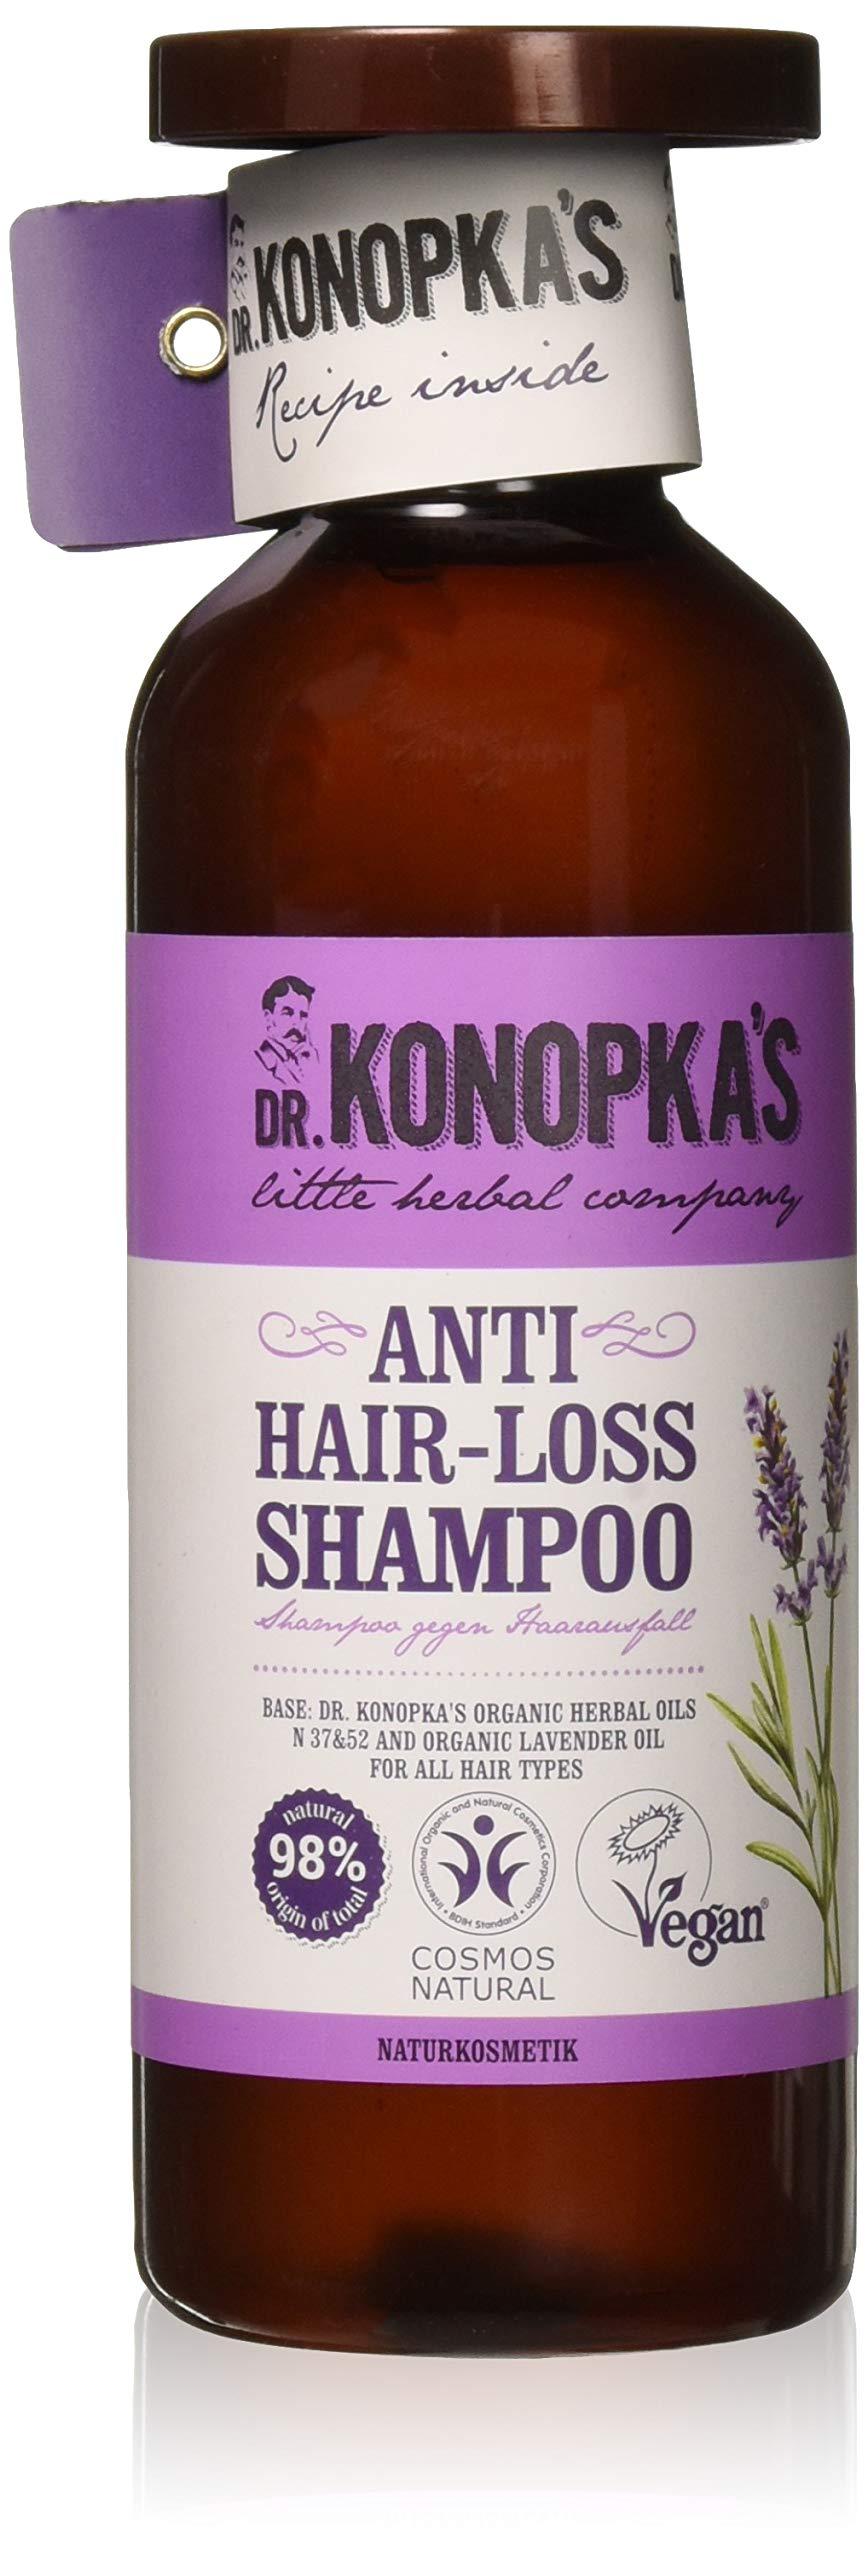 Dr.Konopka's Anti Hair-Loss Shampoo, 500 ml